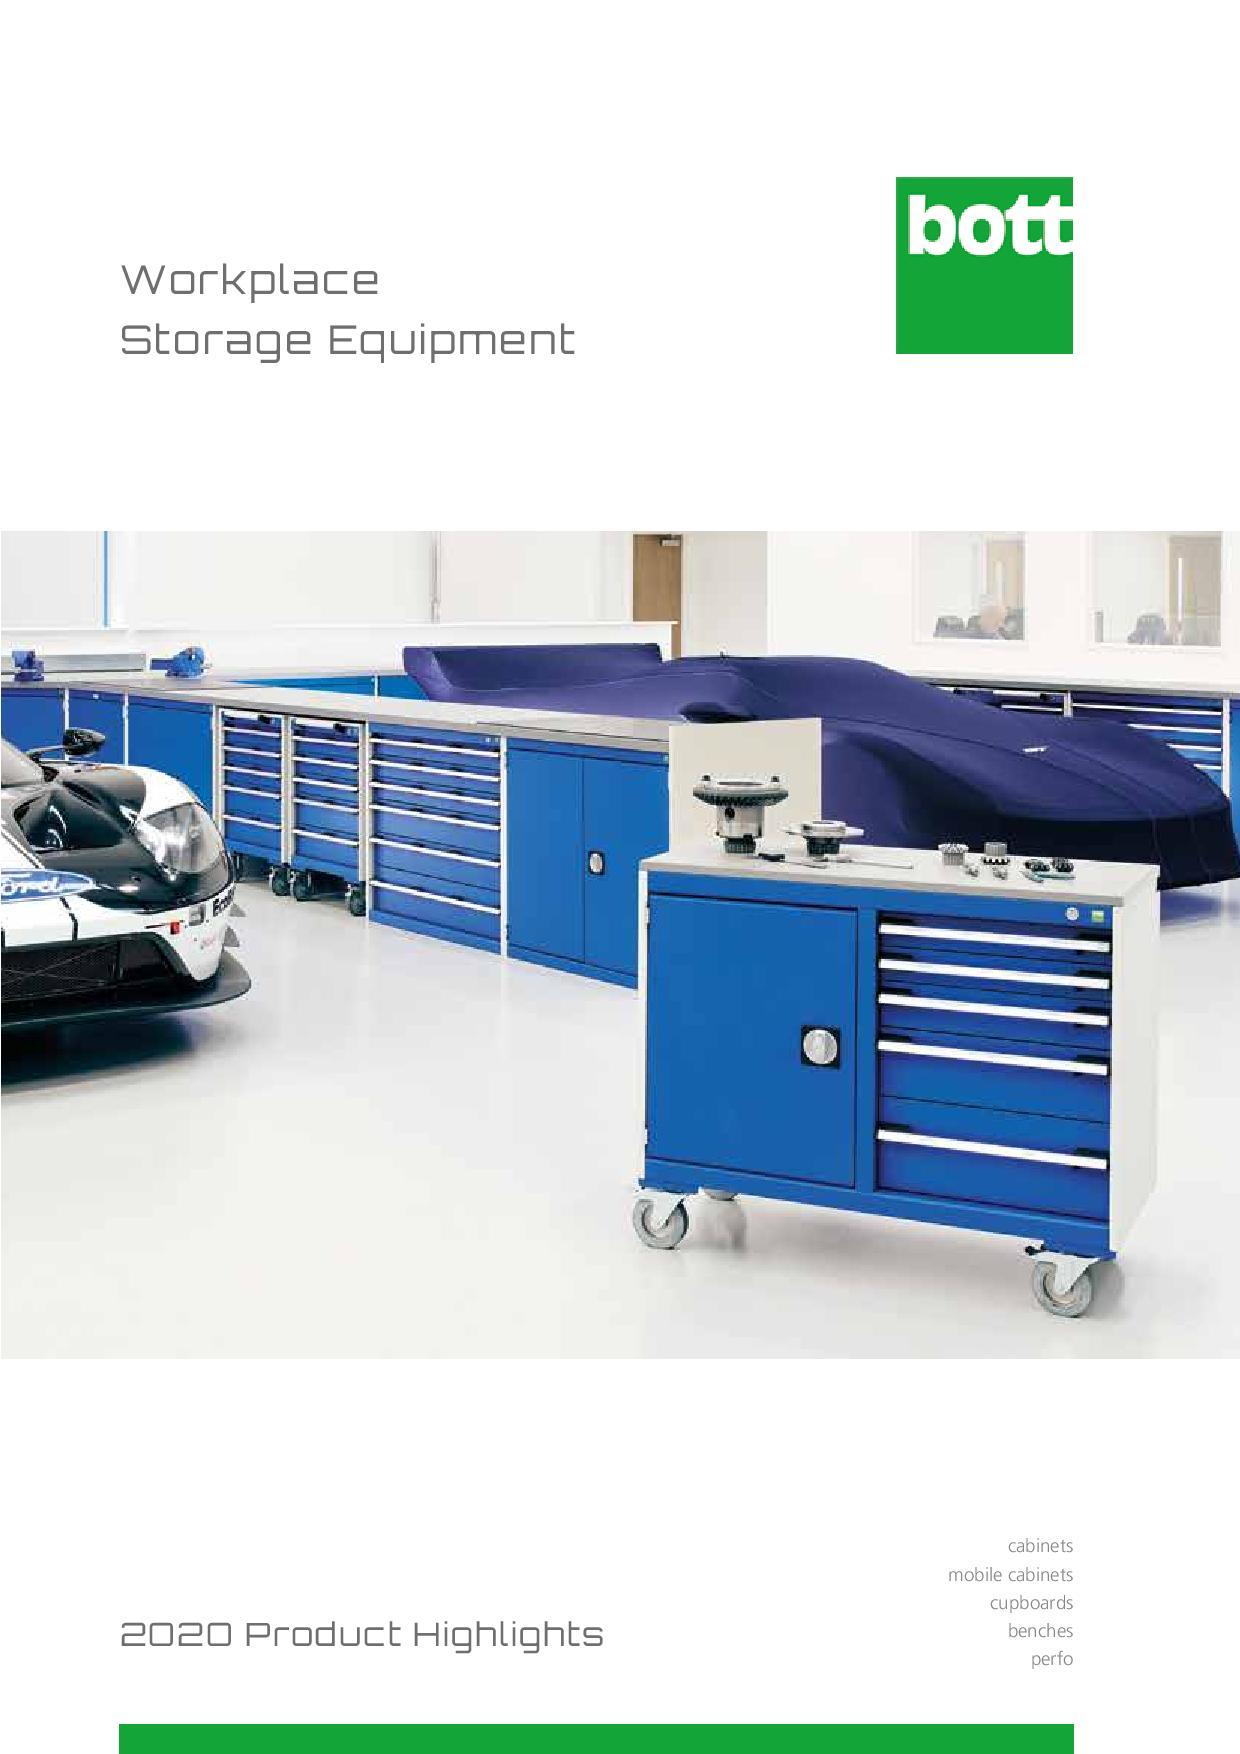 2020 Workplace Storage Equipment - Highlights